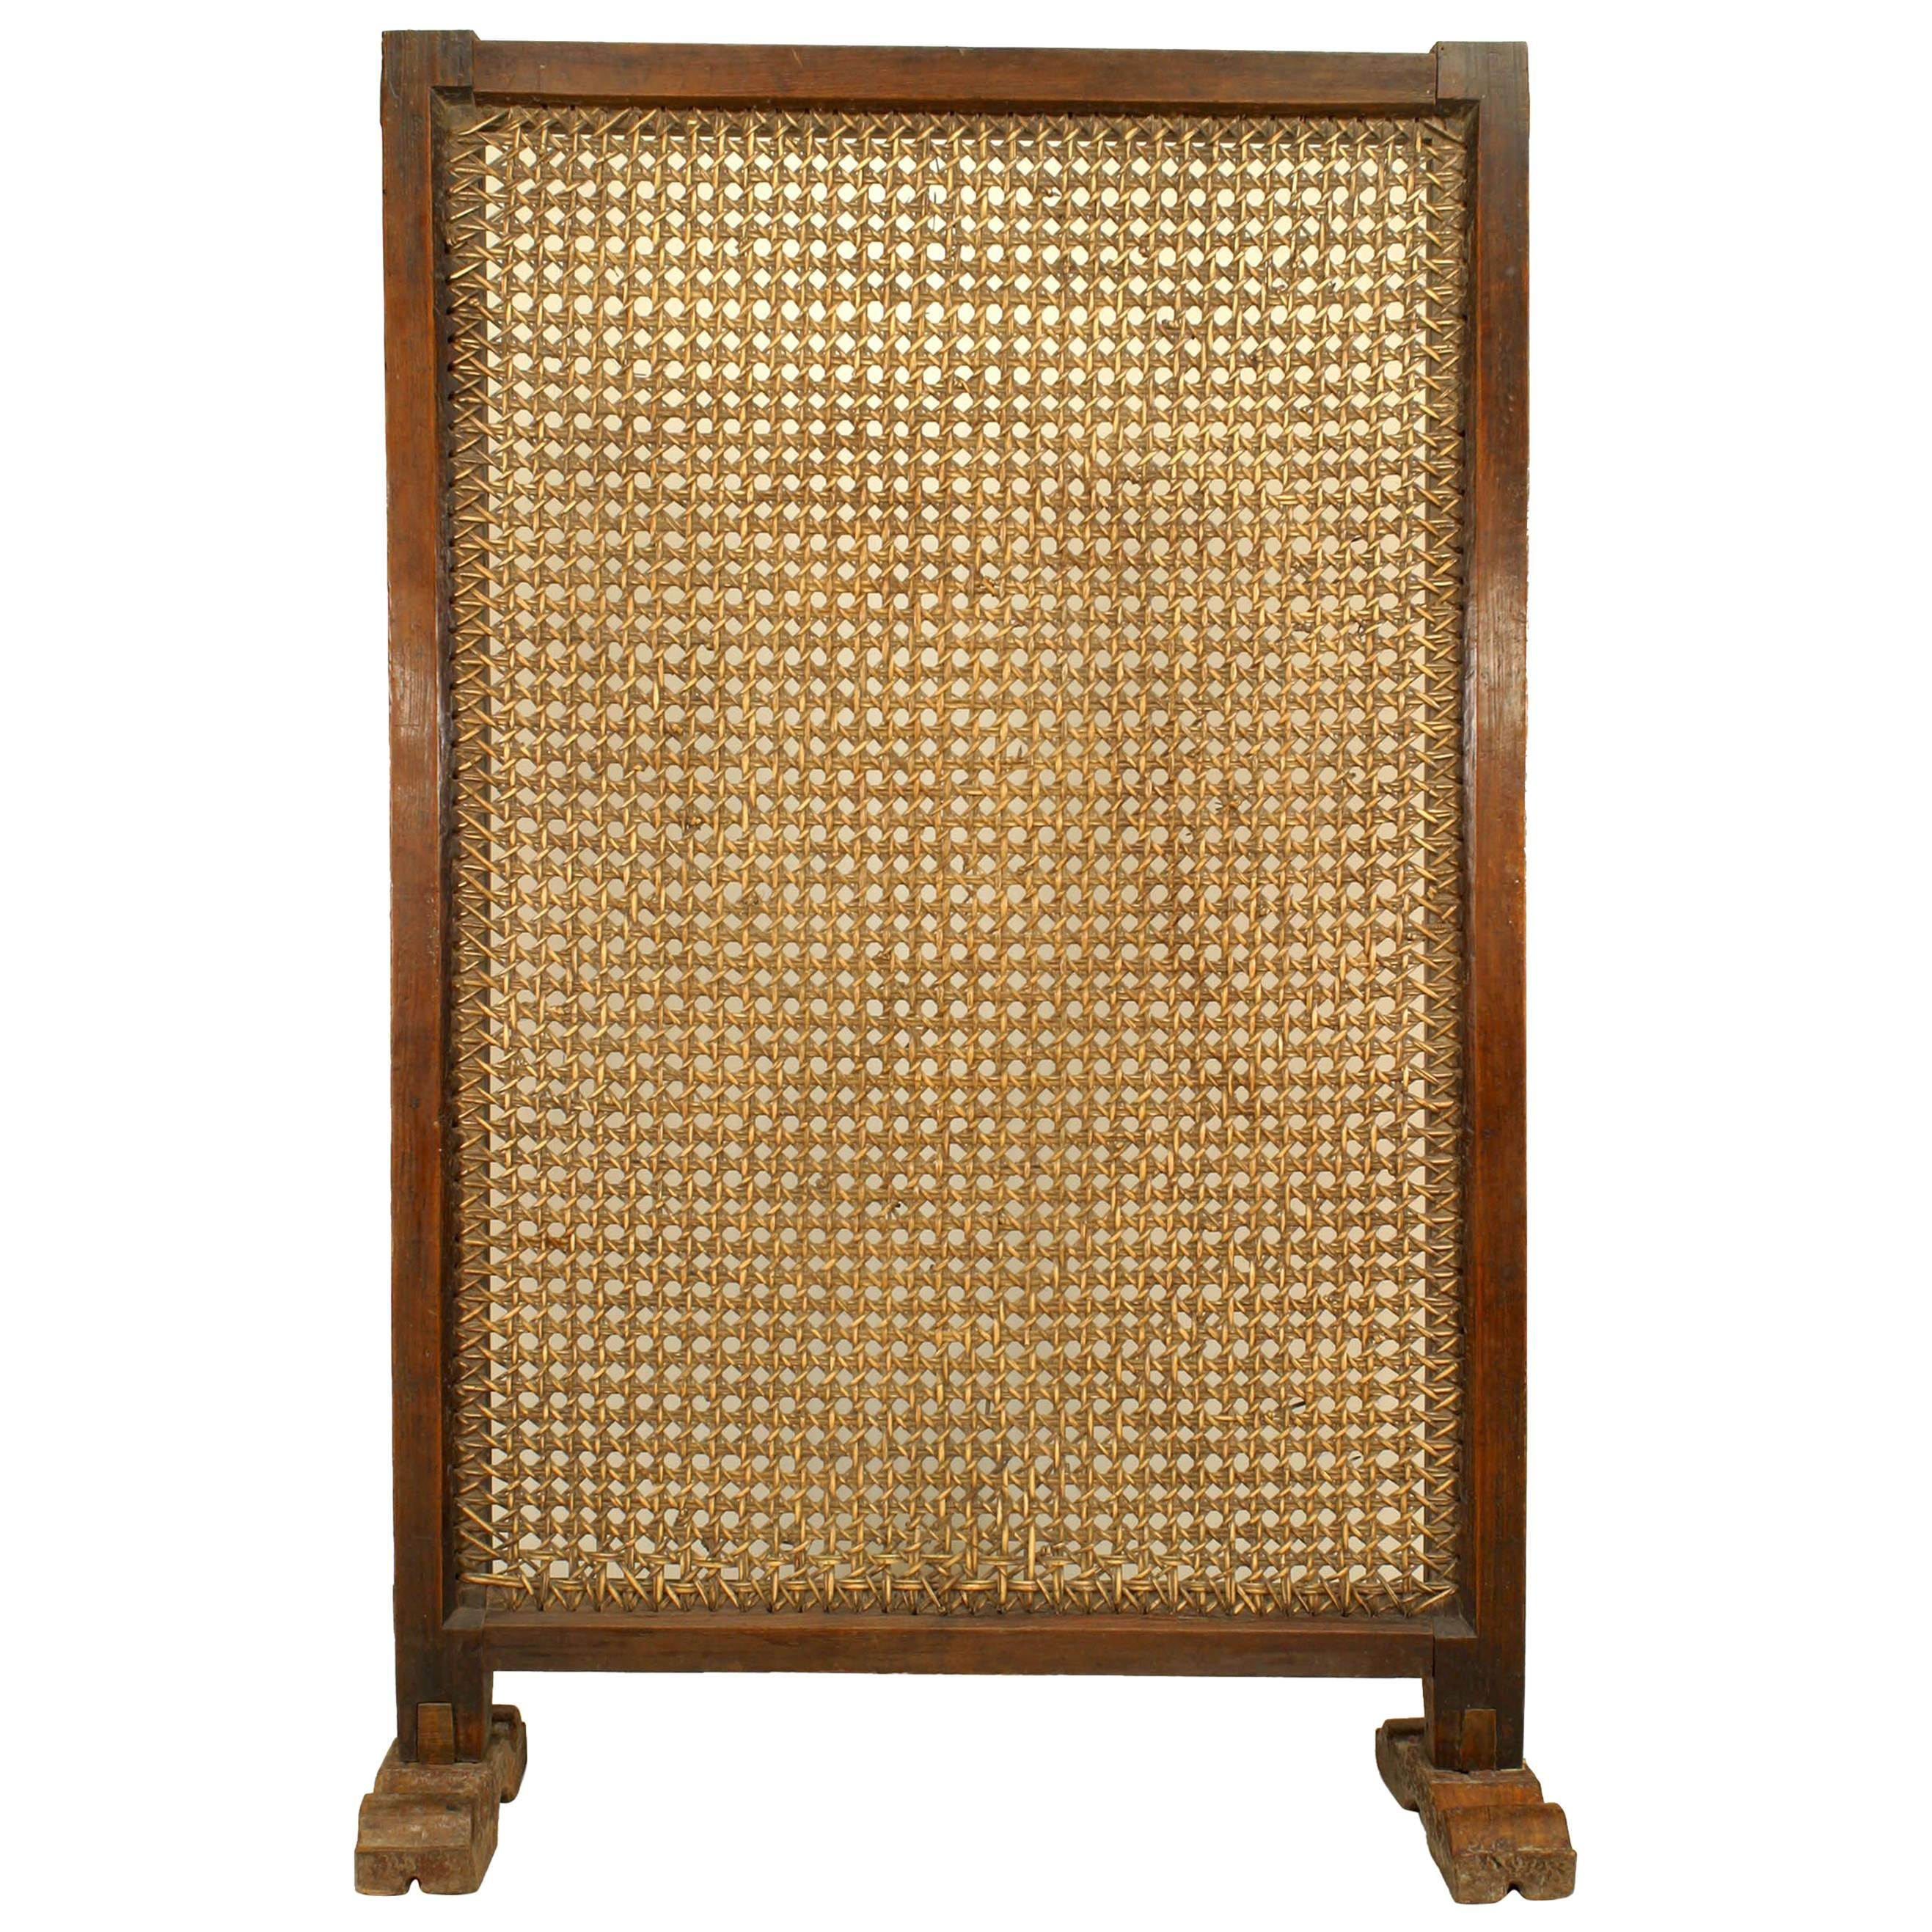 African Hardwood Screen with Wicker Panel